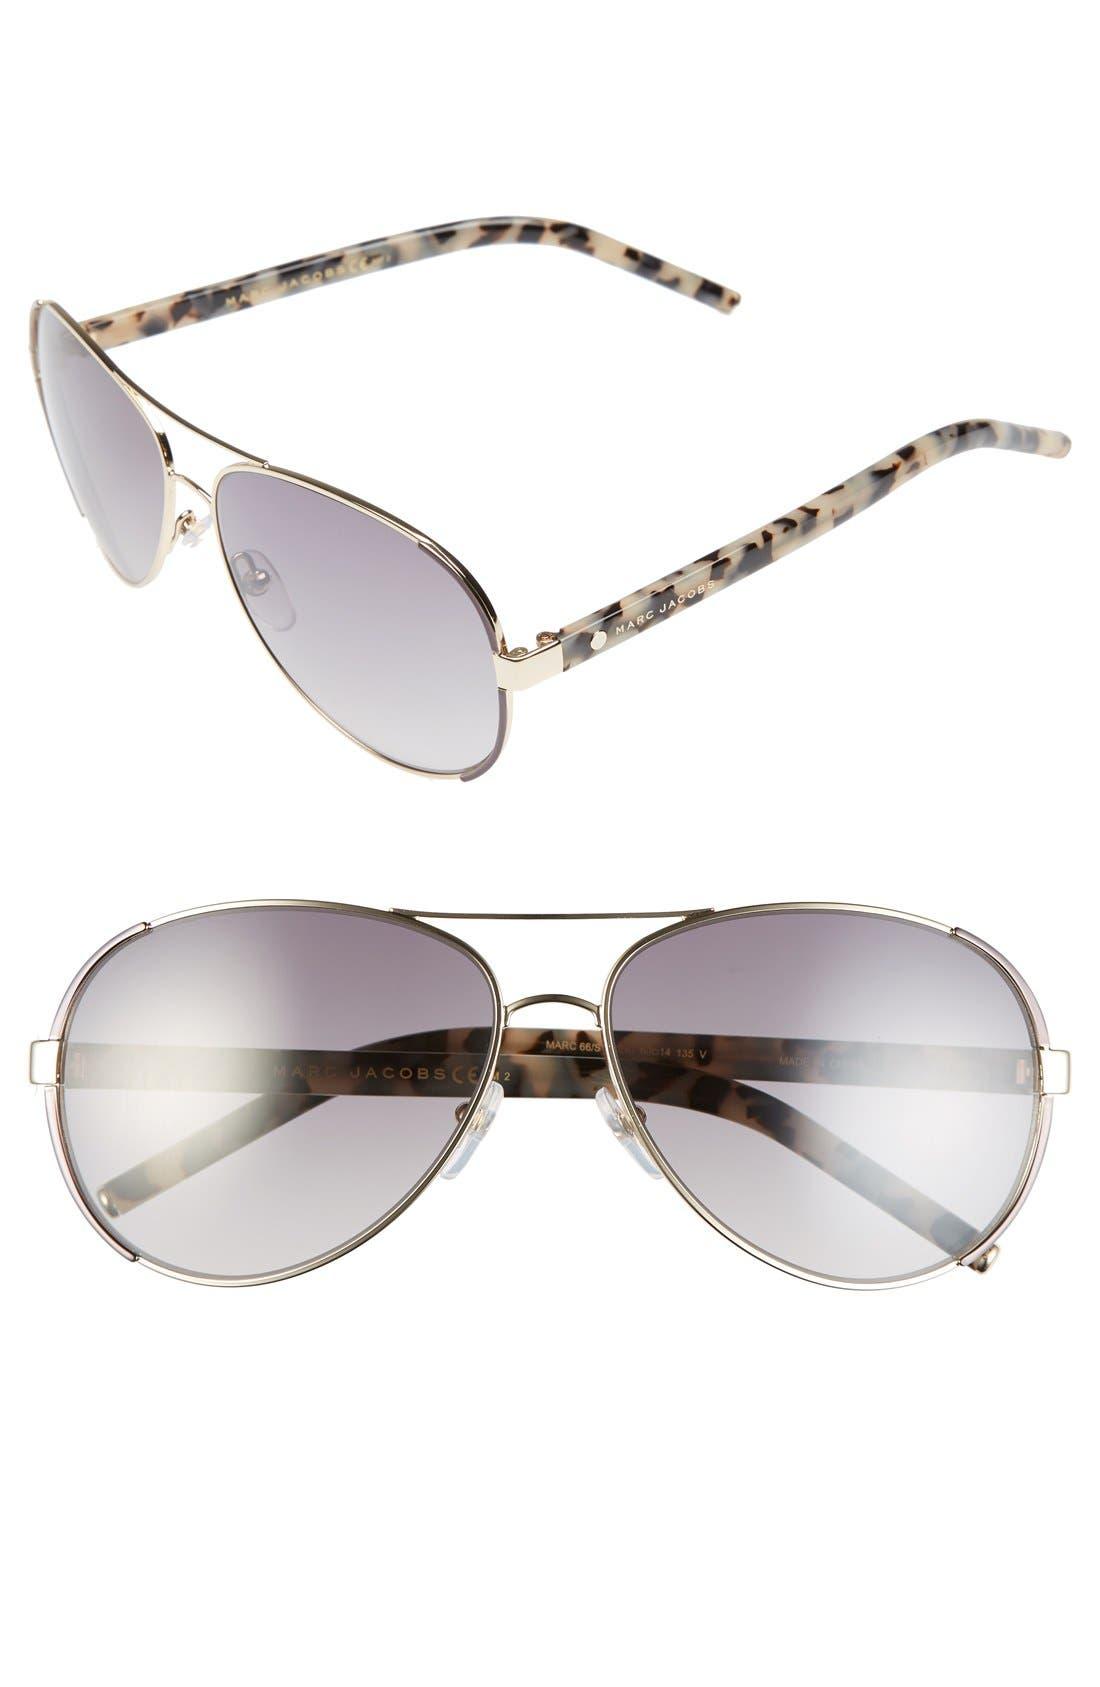 60mm Oversize Aviator Sunglasses,                             Main thumbnail 1, color,                             712